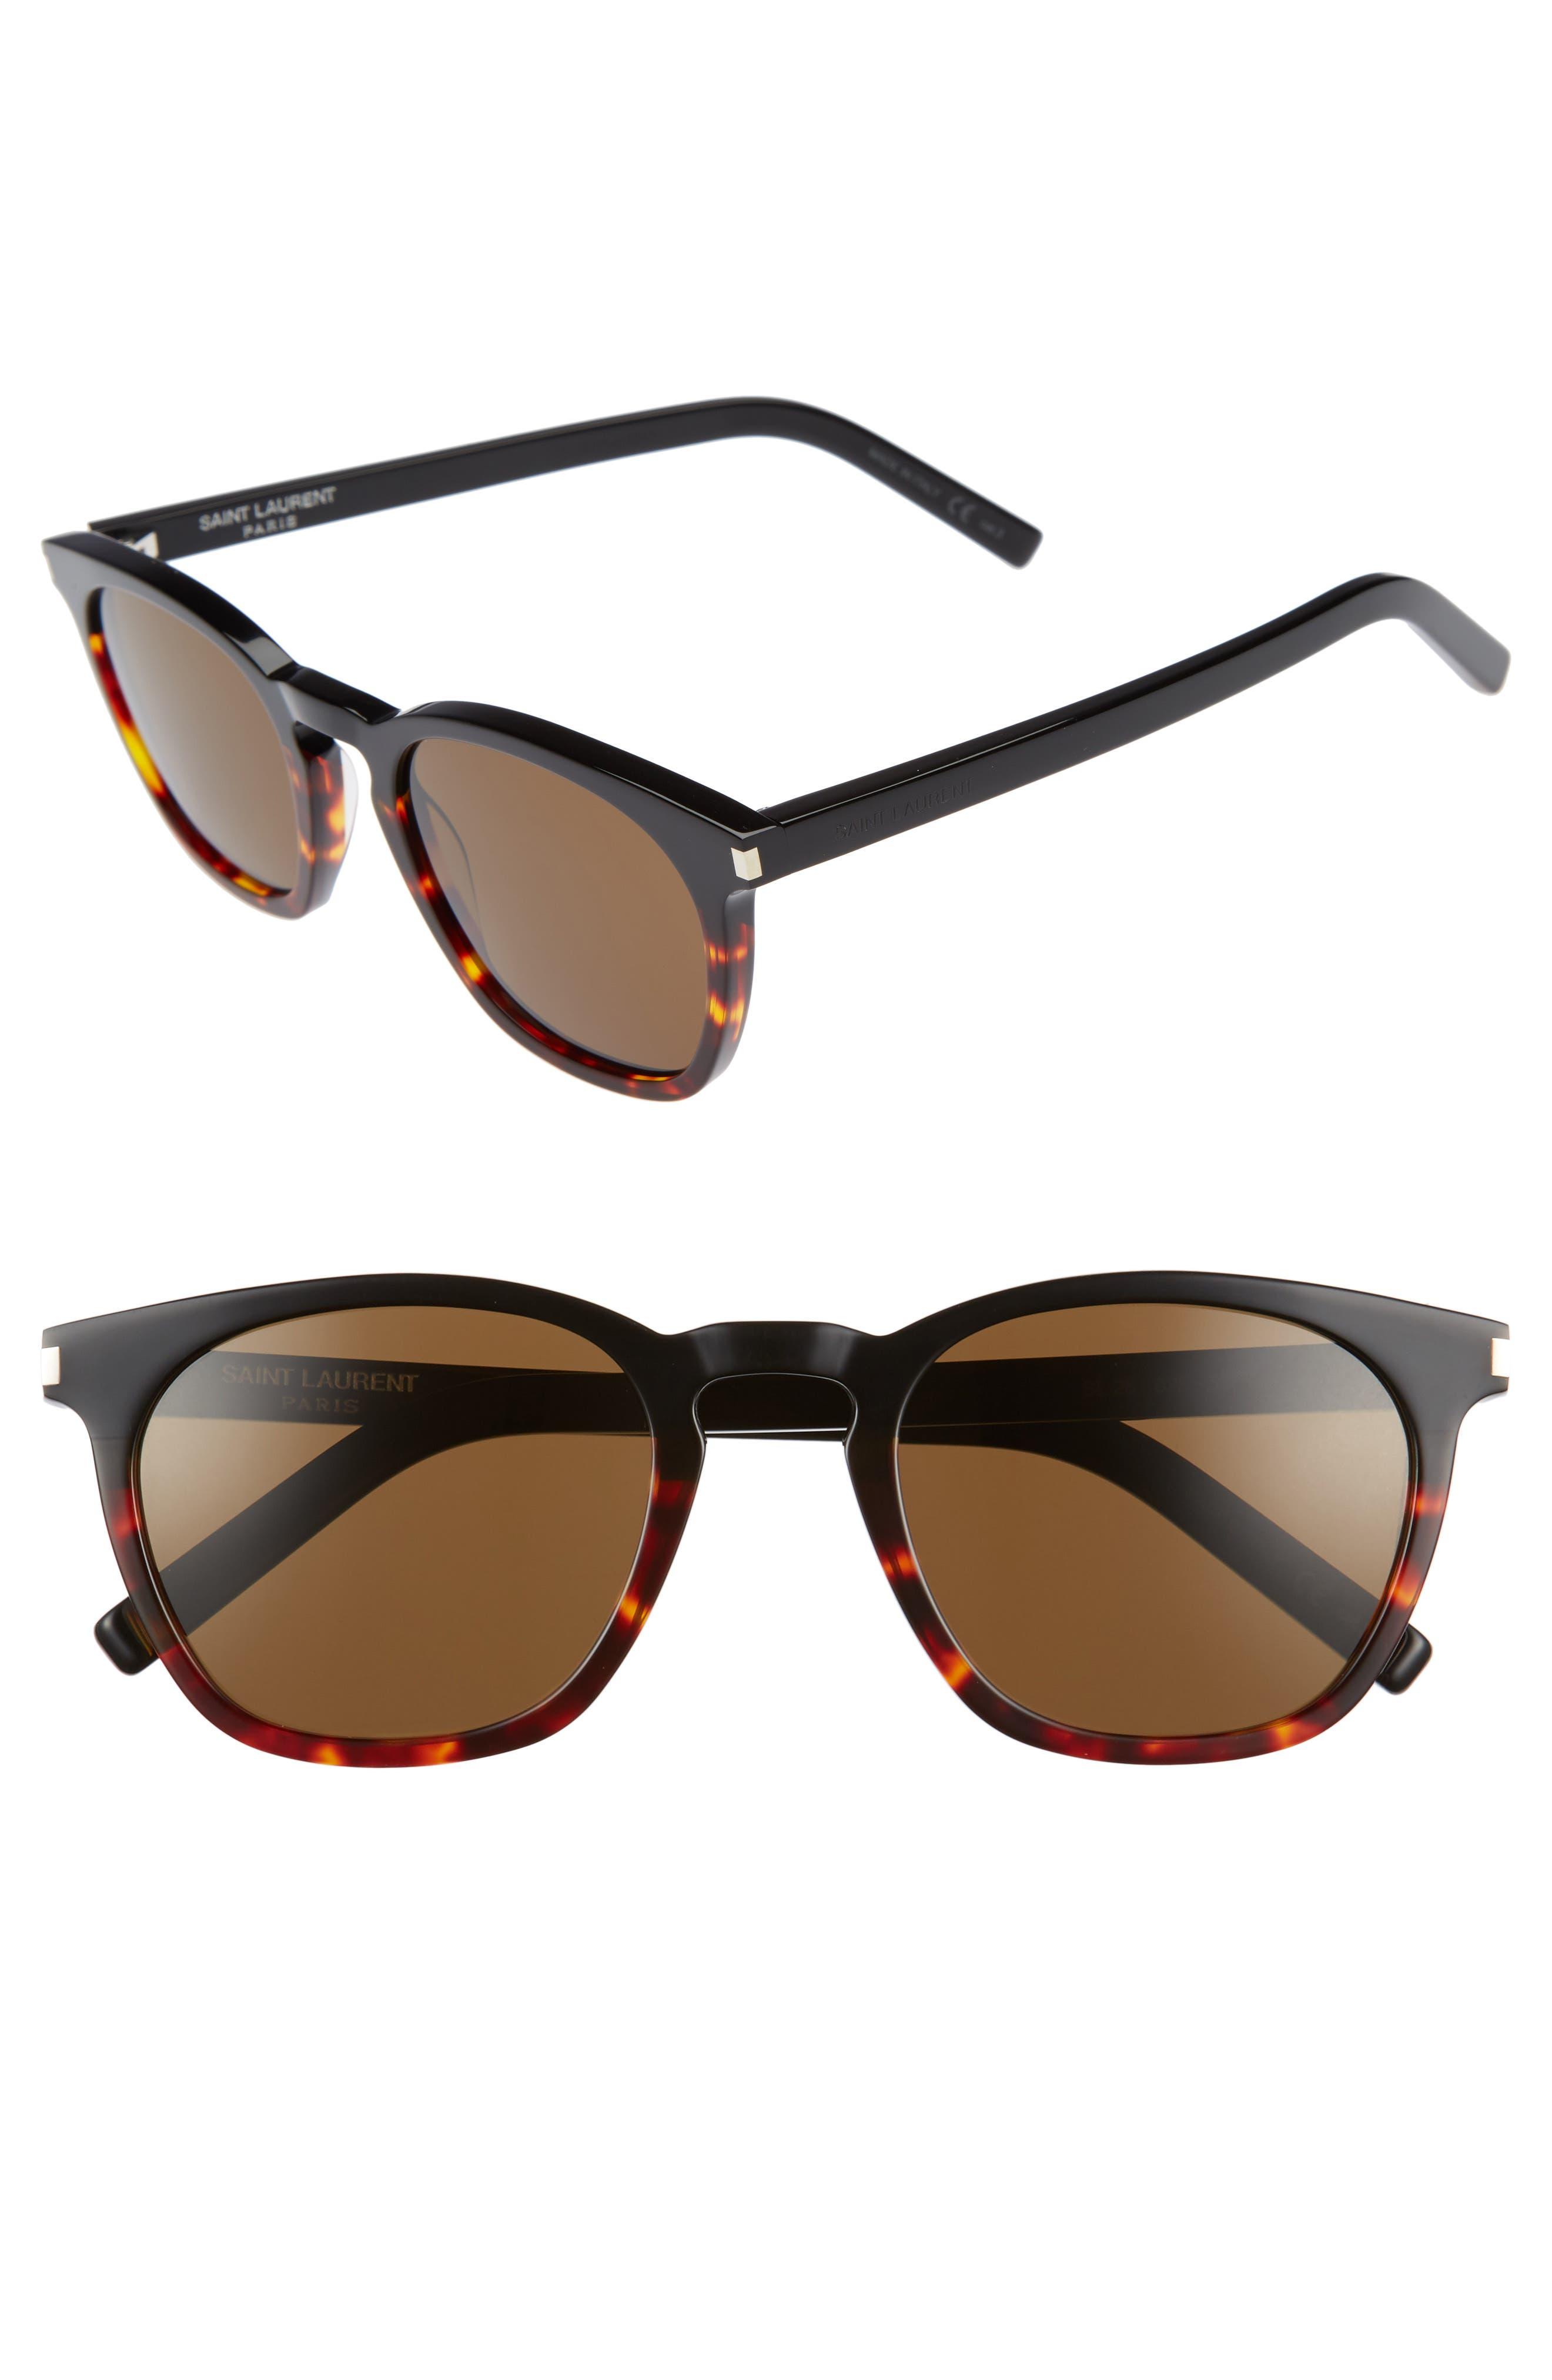 Saint Laurent SL 28 51mm Keyhole Sunglasses